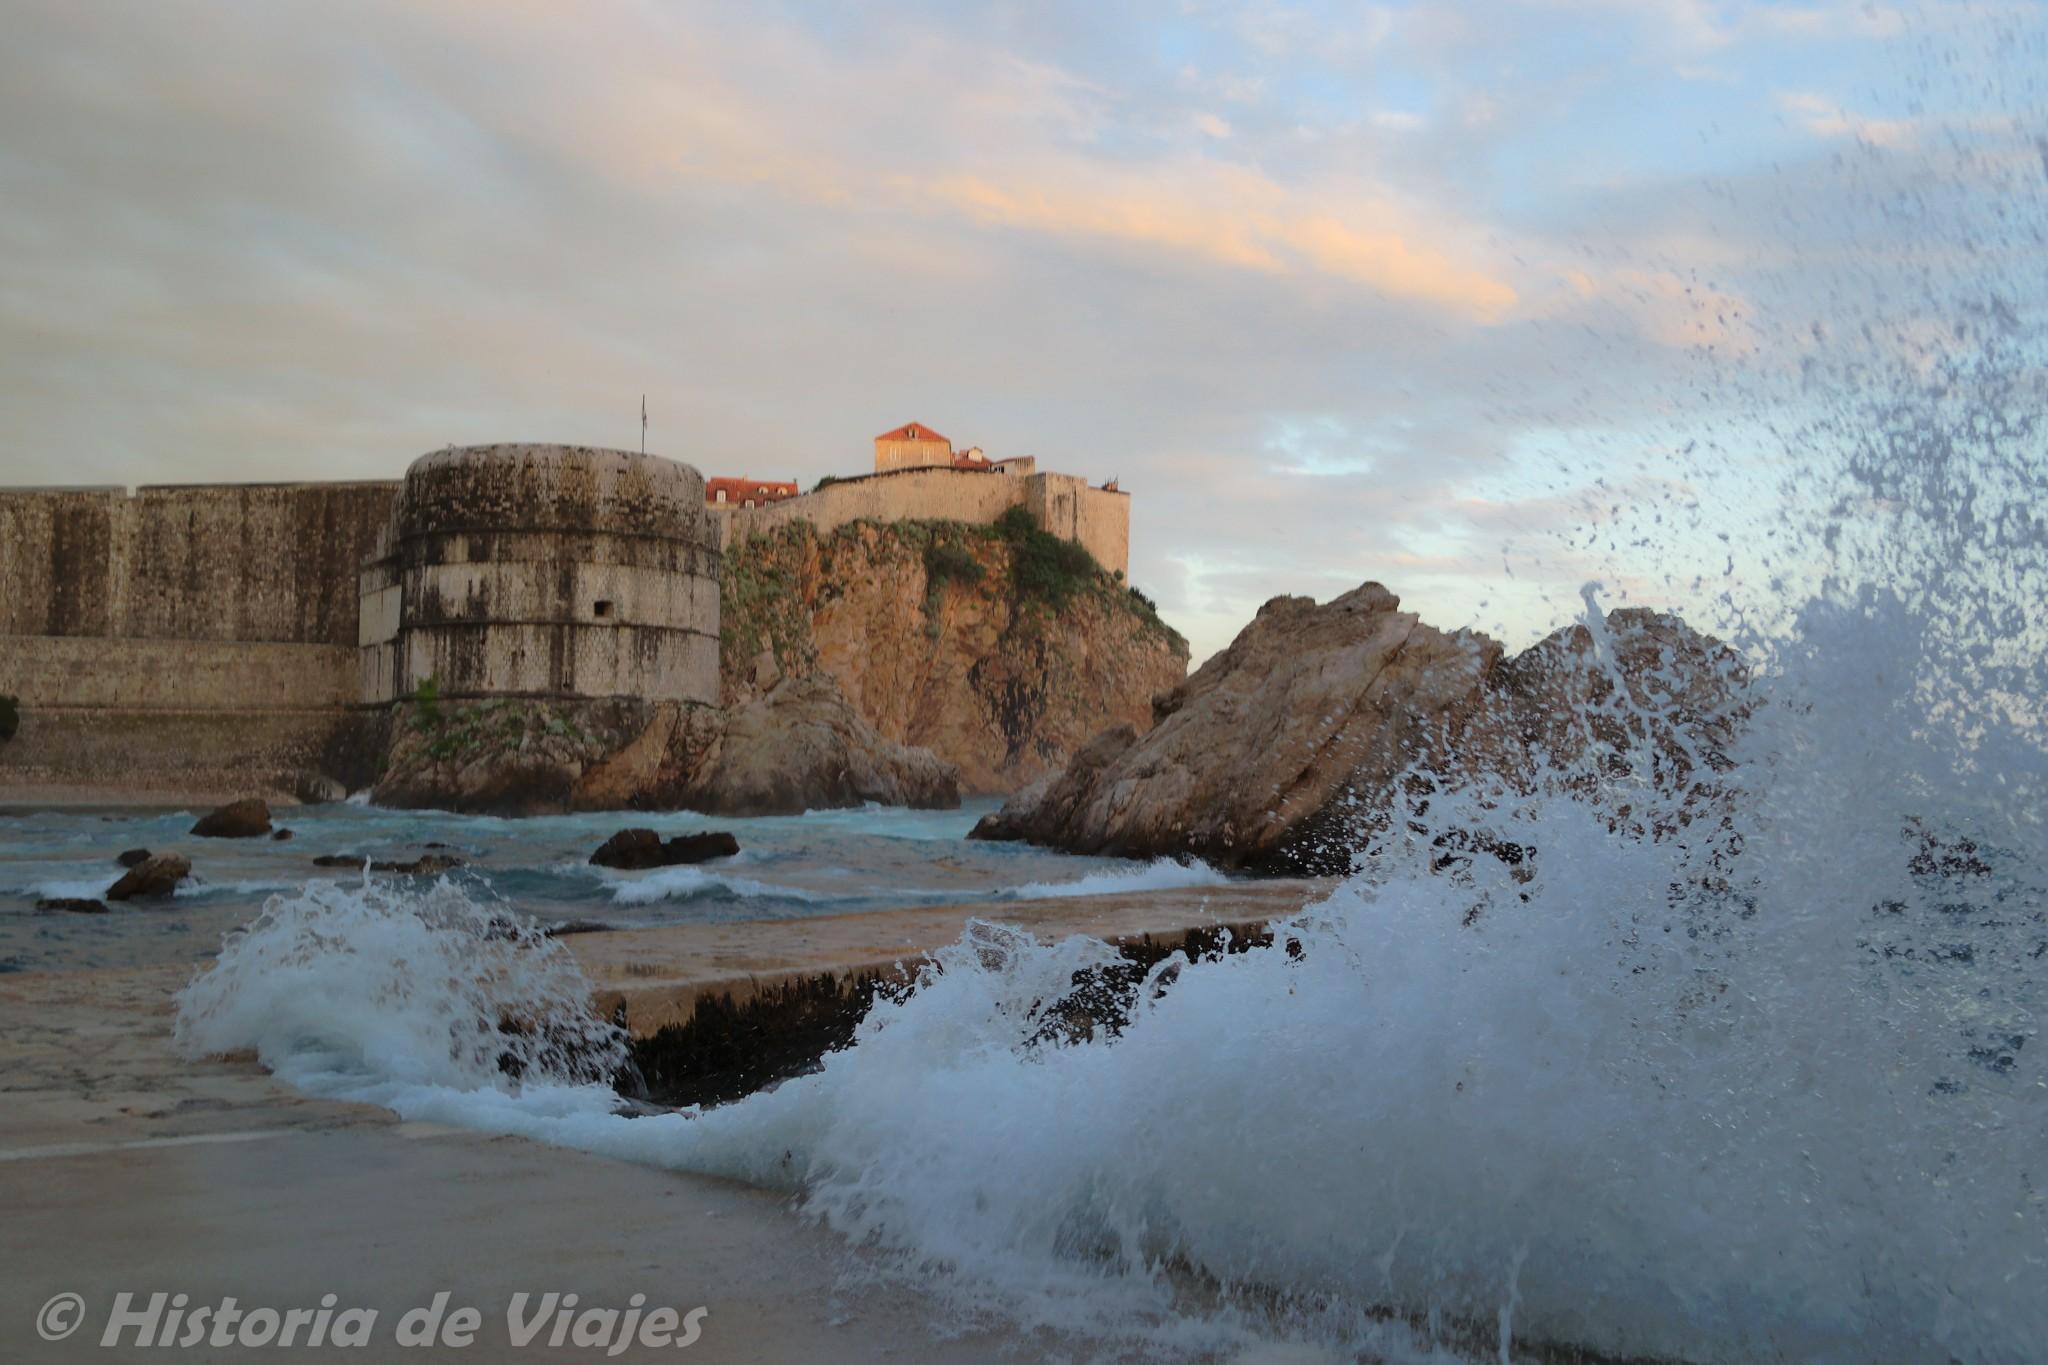 Dubrovnik_vanhakaupunki1